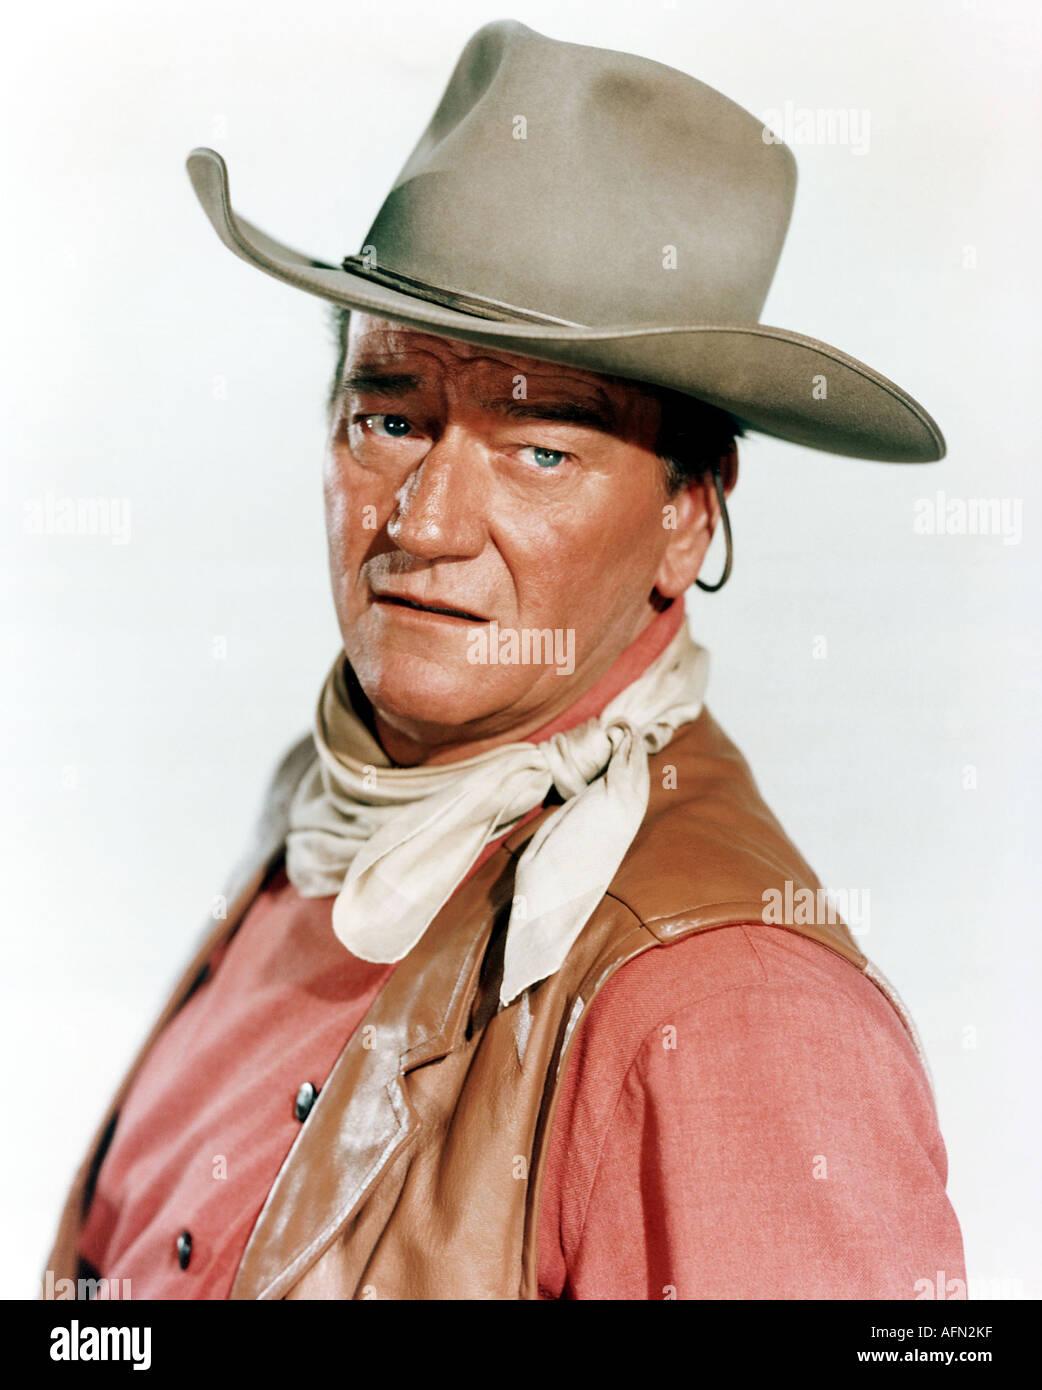 JOHN WAYNE US actor - Stock Image